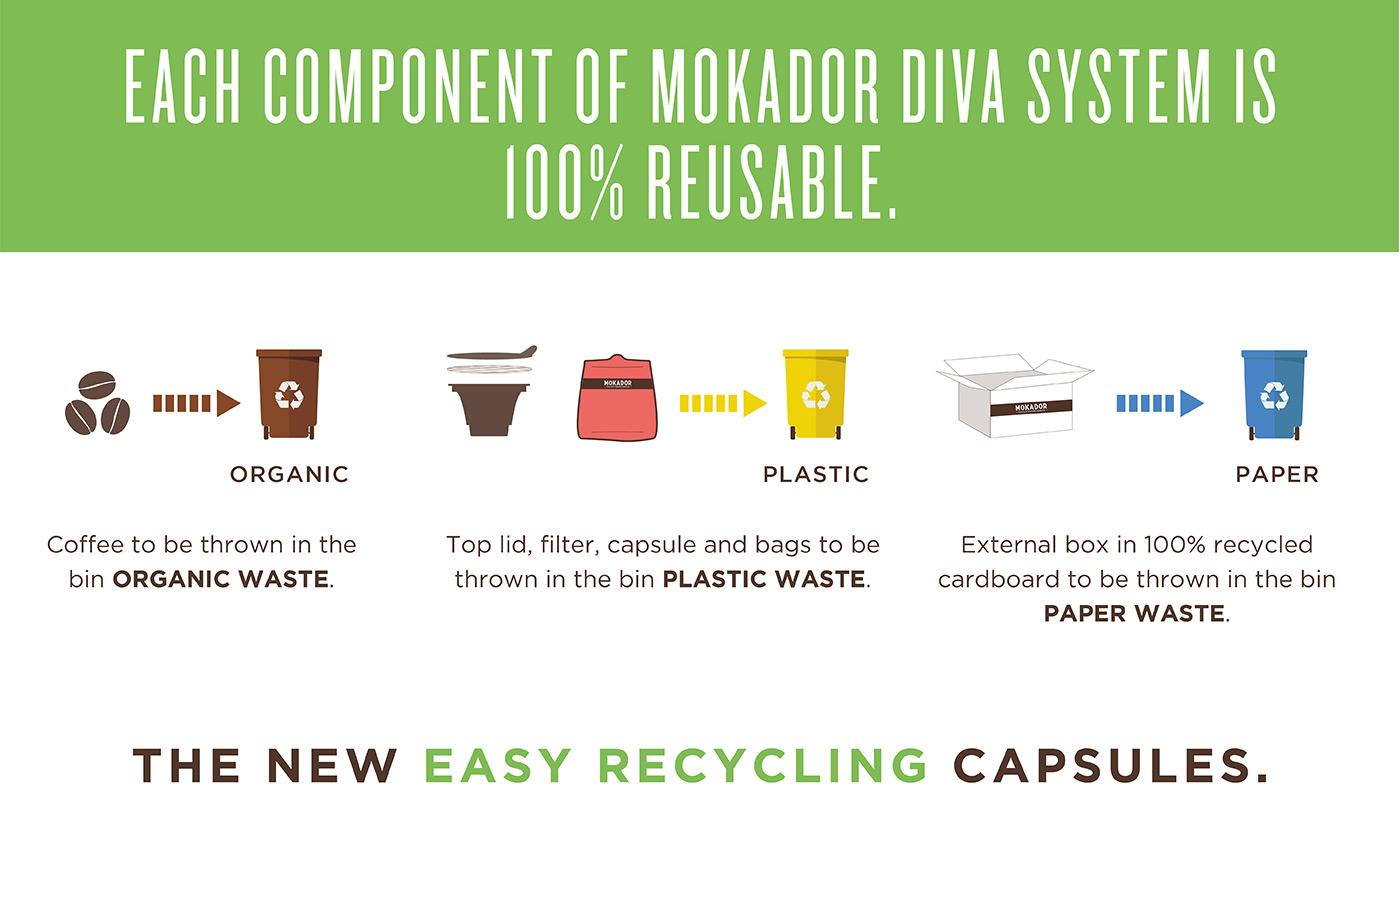 Mokador Diva - Recyclable capsule